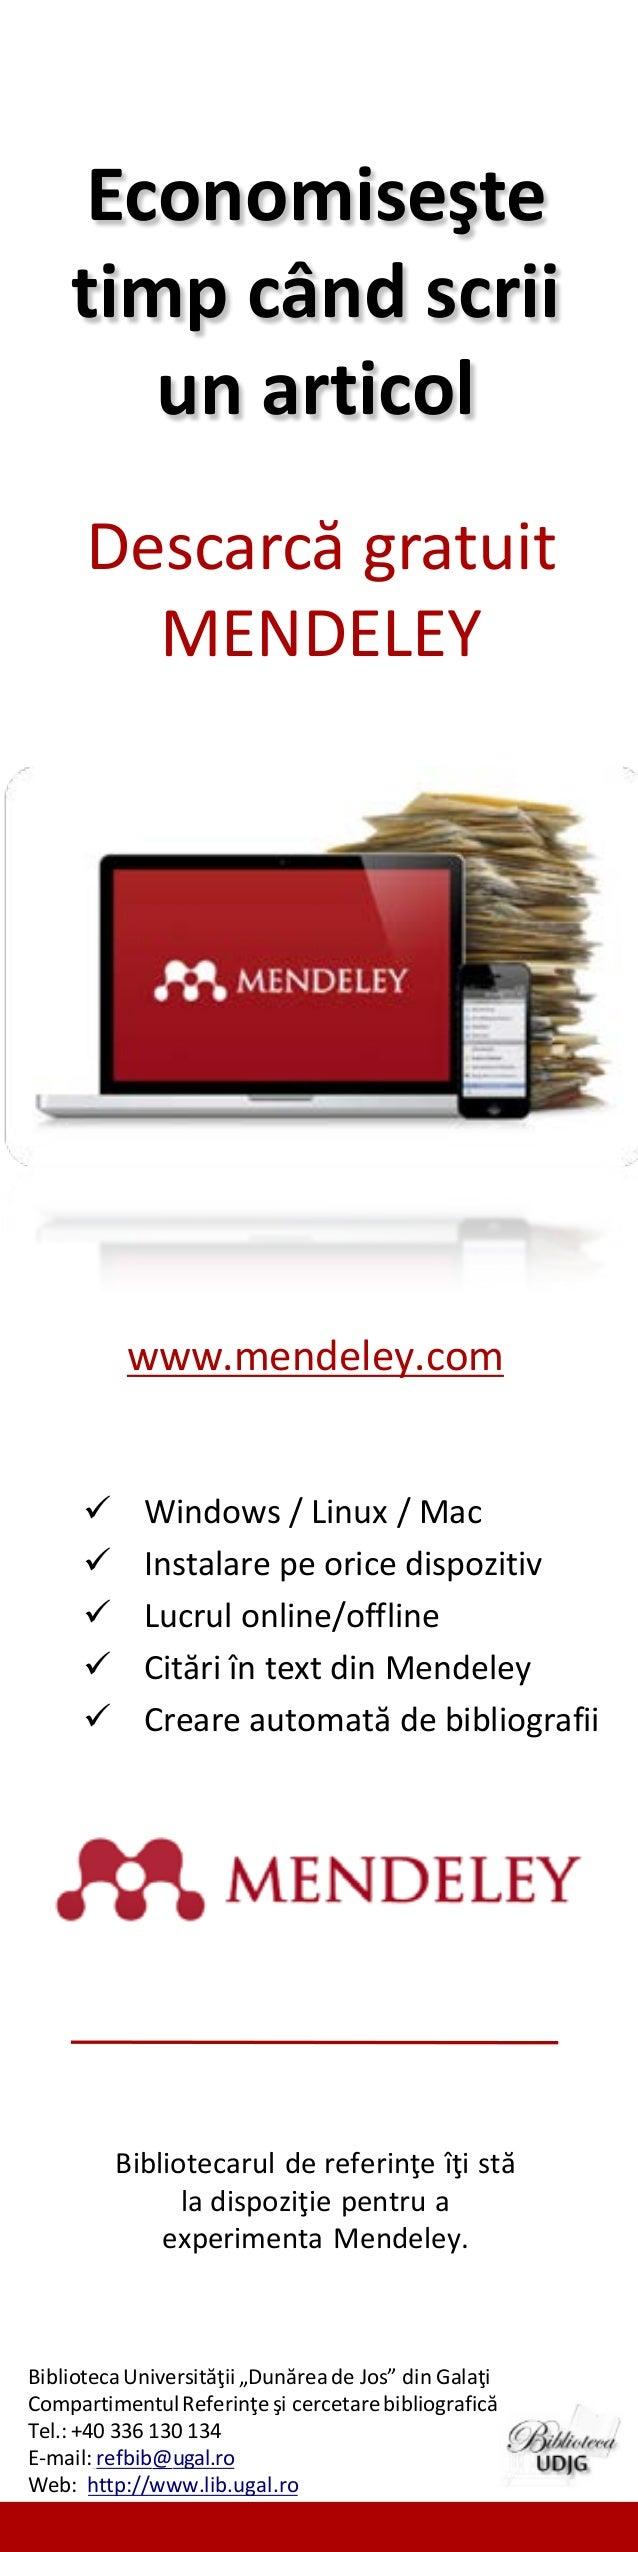 Semn carte Mendeley